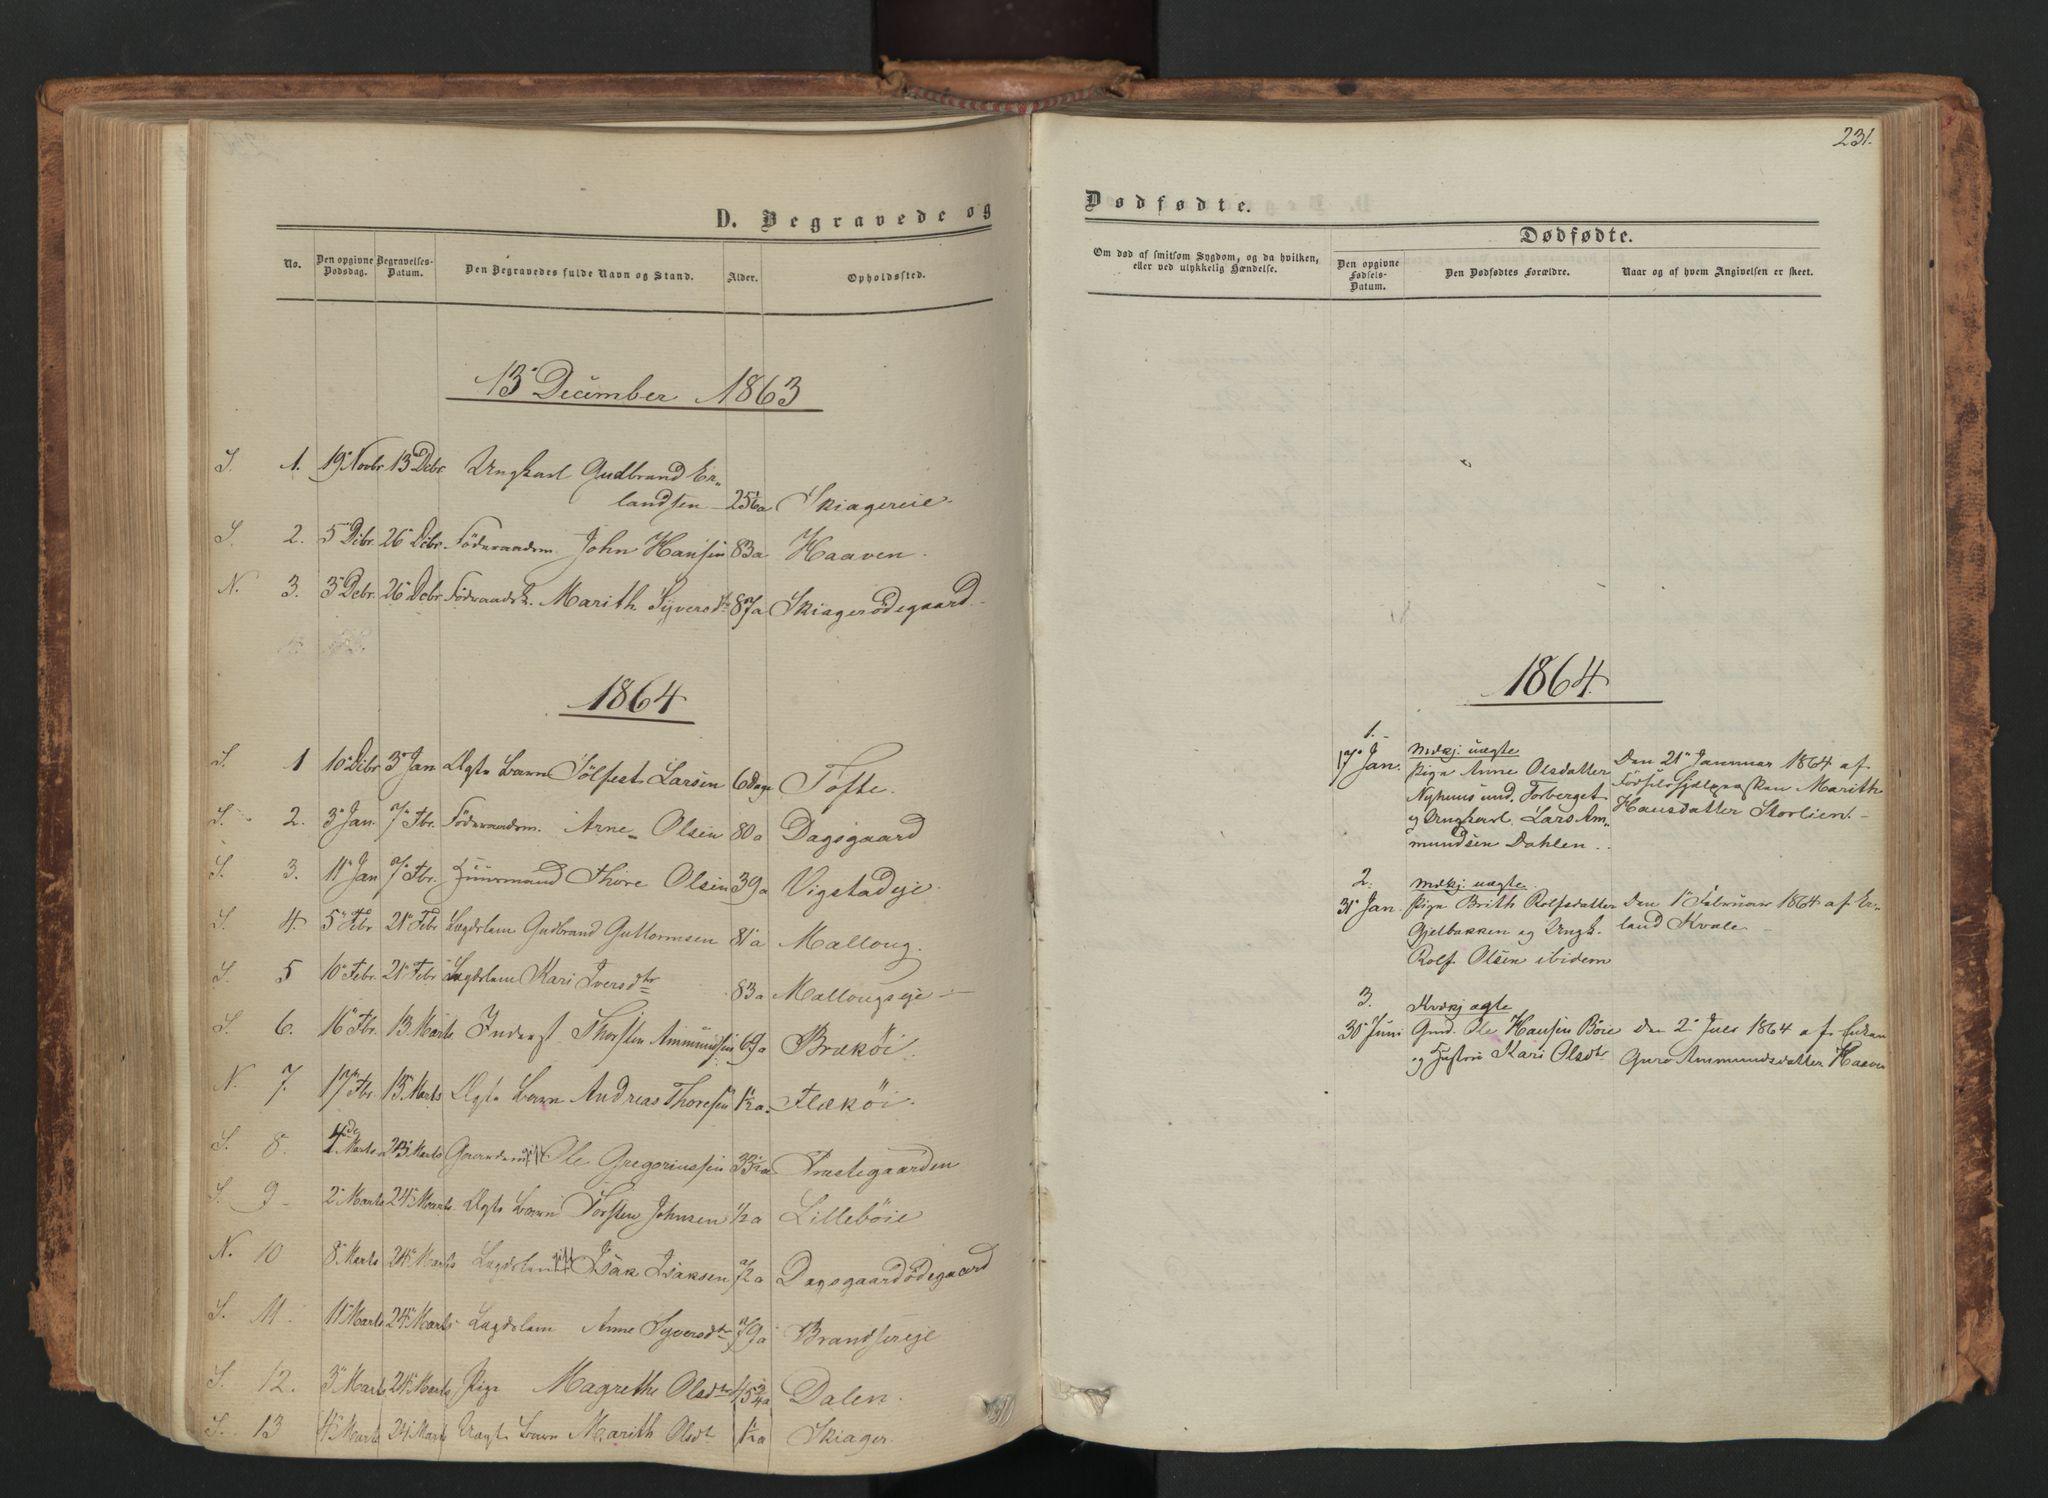 SAH, Skjåk prestekontor, Ministerialbok nr. 1, 1863-1879, s. 231